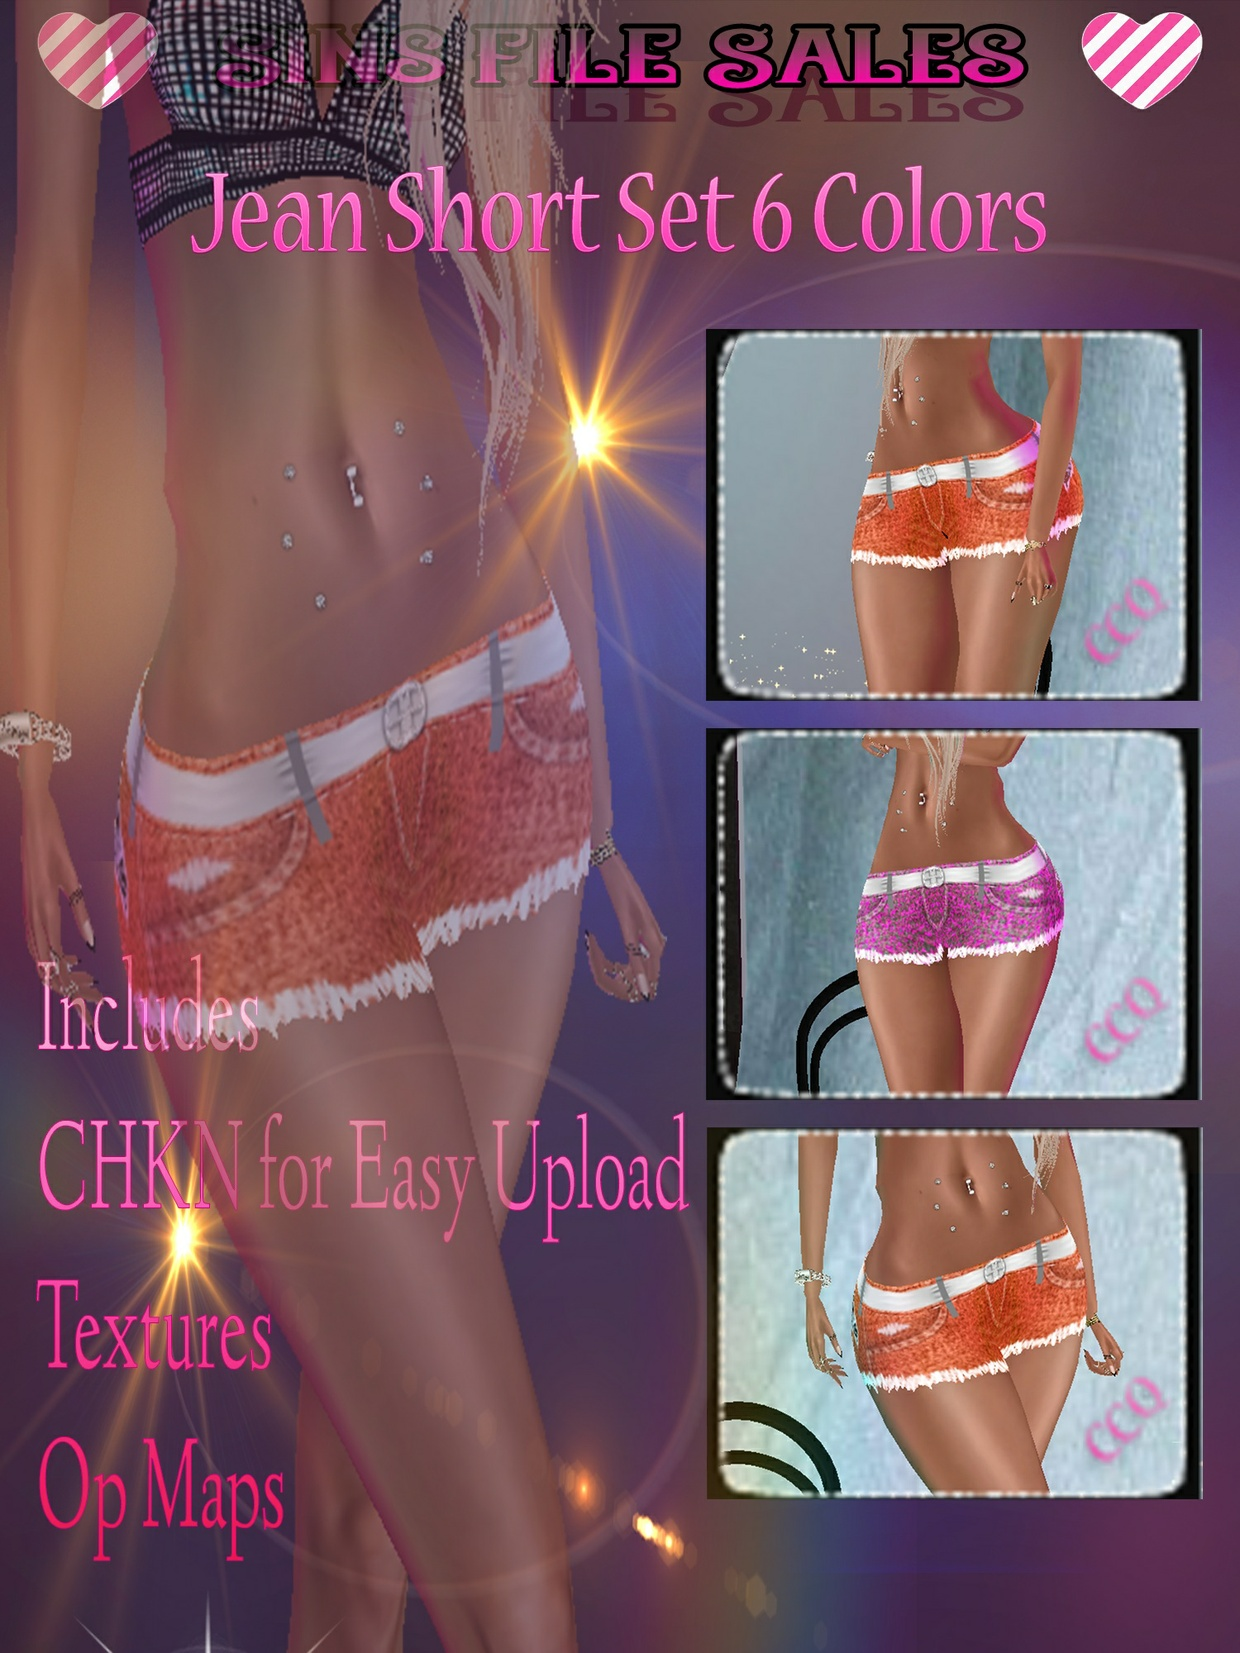 Short Set * 6 Colors + CHKN